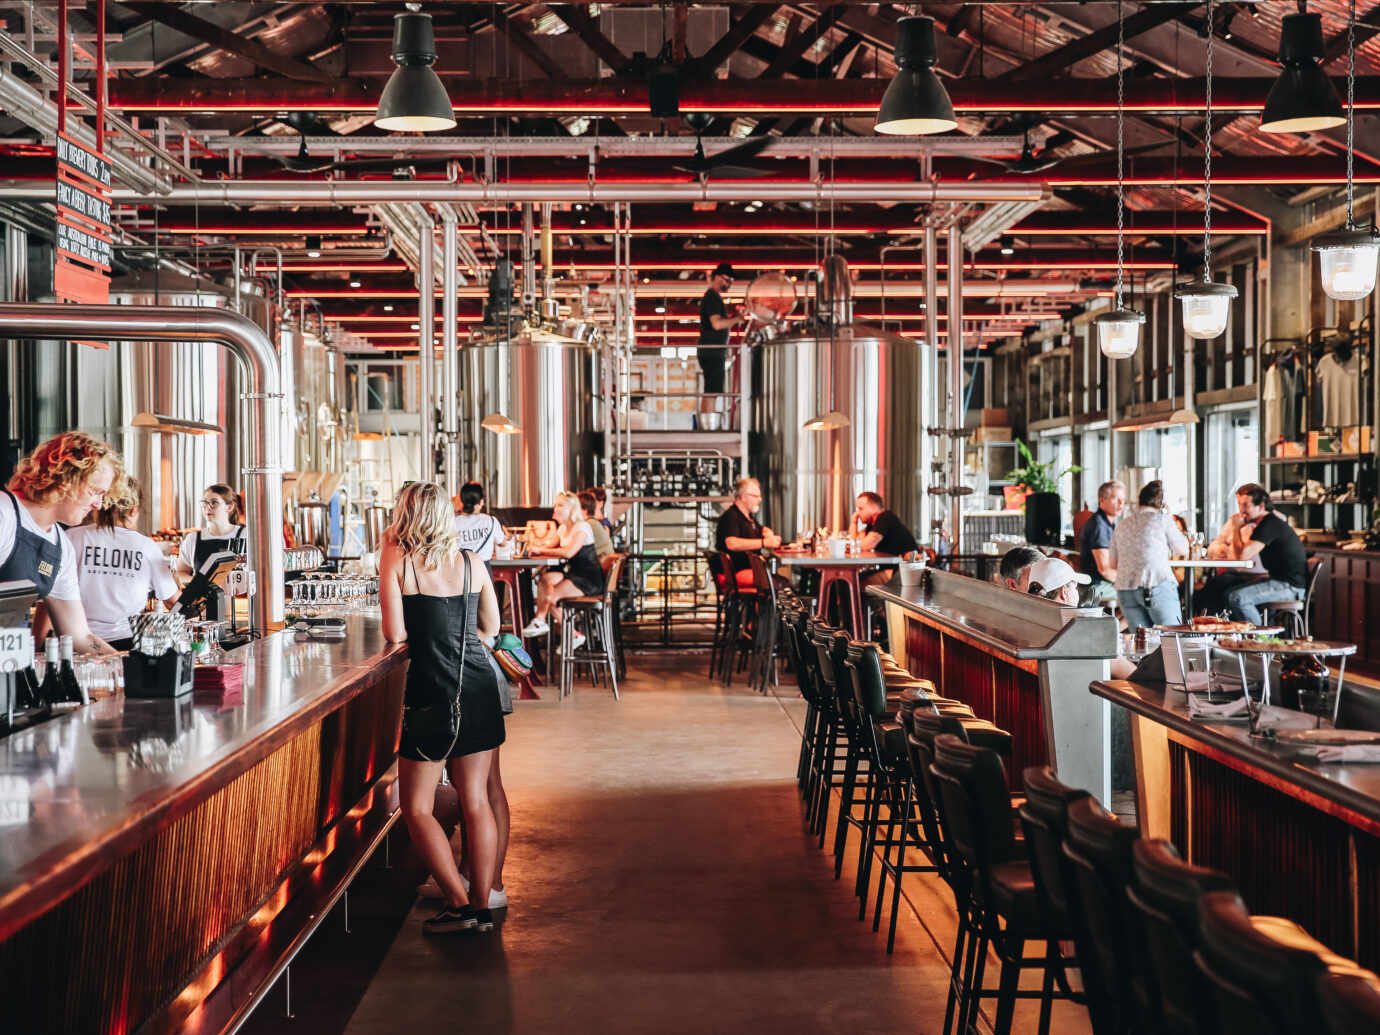 Interior of Felons Brewery in Brisbane Australia